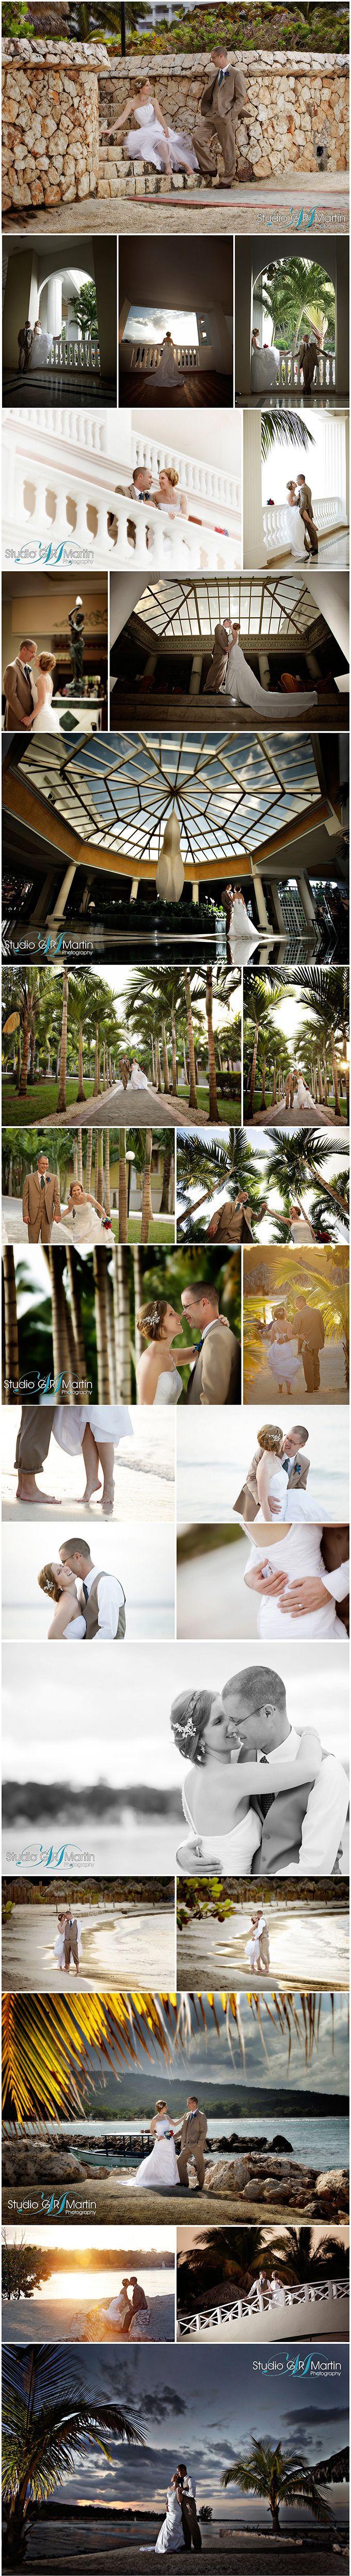 Weddings-Destination - Studio G.R. Martin Photography - Jamaica Destination wedding - Ottawa wedding photographers in Jamaica - Grand Bahia Principe resort Jamaica wedding